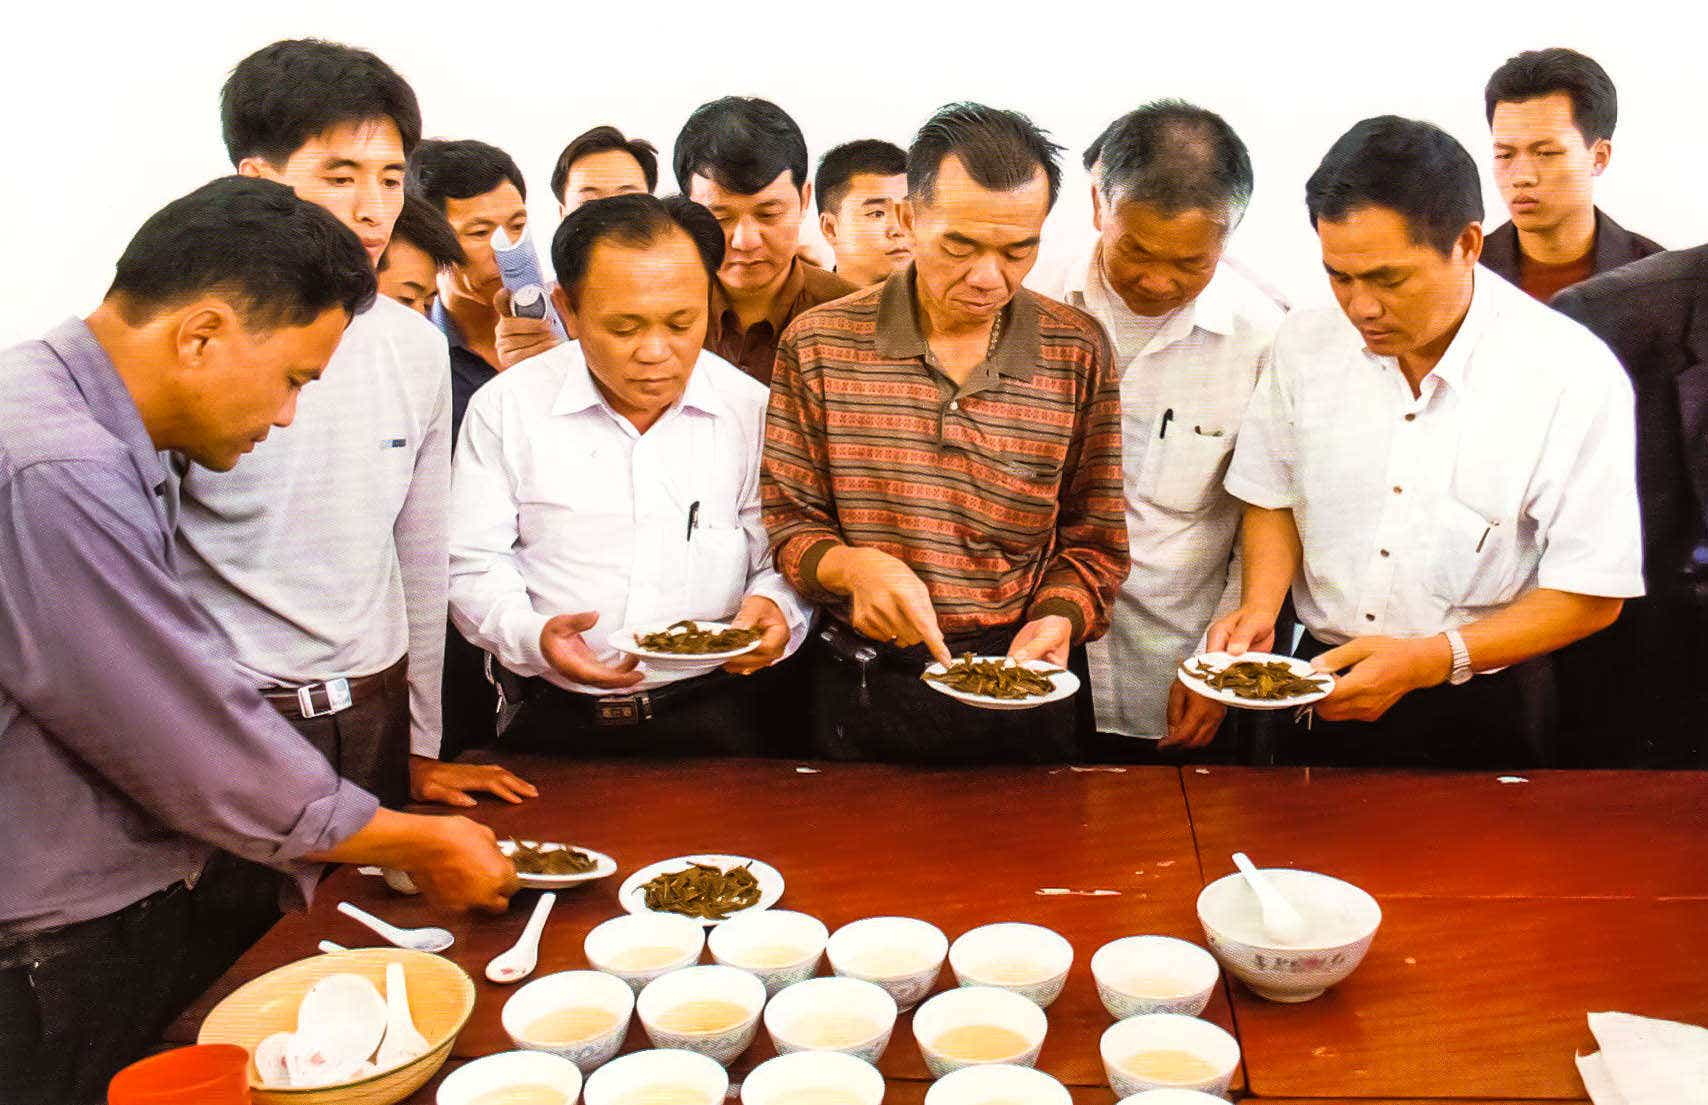 file photo, courtesy of 中国凤凰茶:茶史茶事茶人